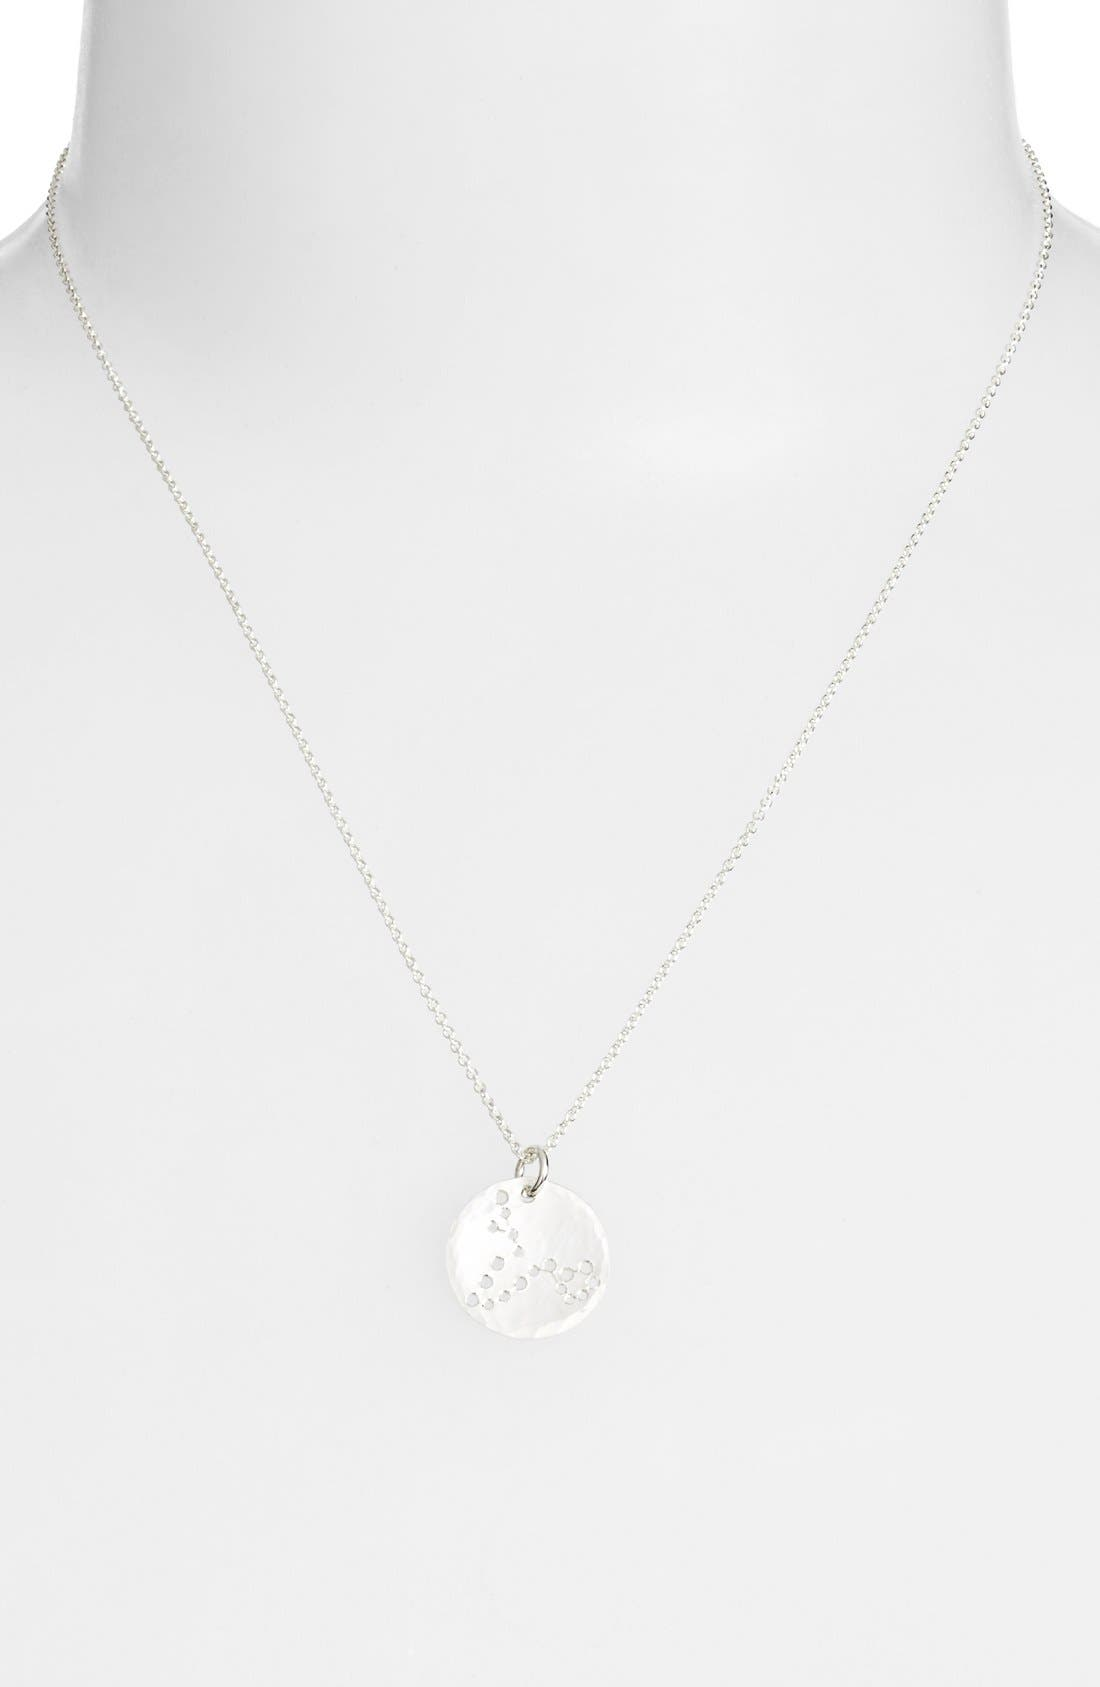 Ija 'Small Zodiac' Sterling Silver Necklace,                             Alternate thumbnail 14, color,